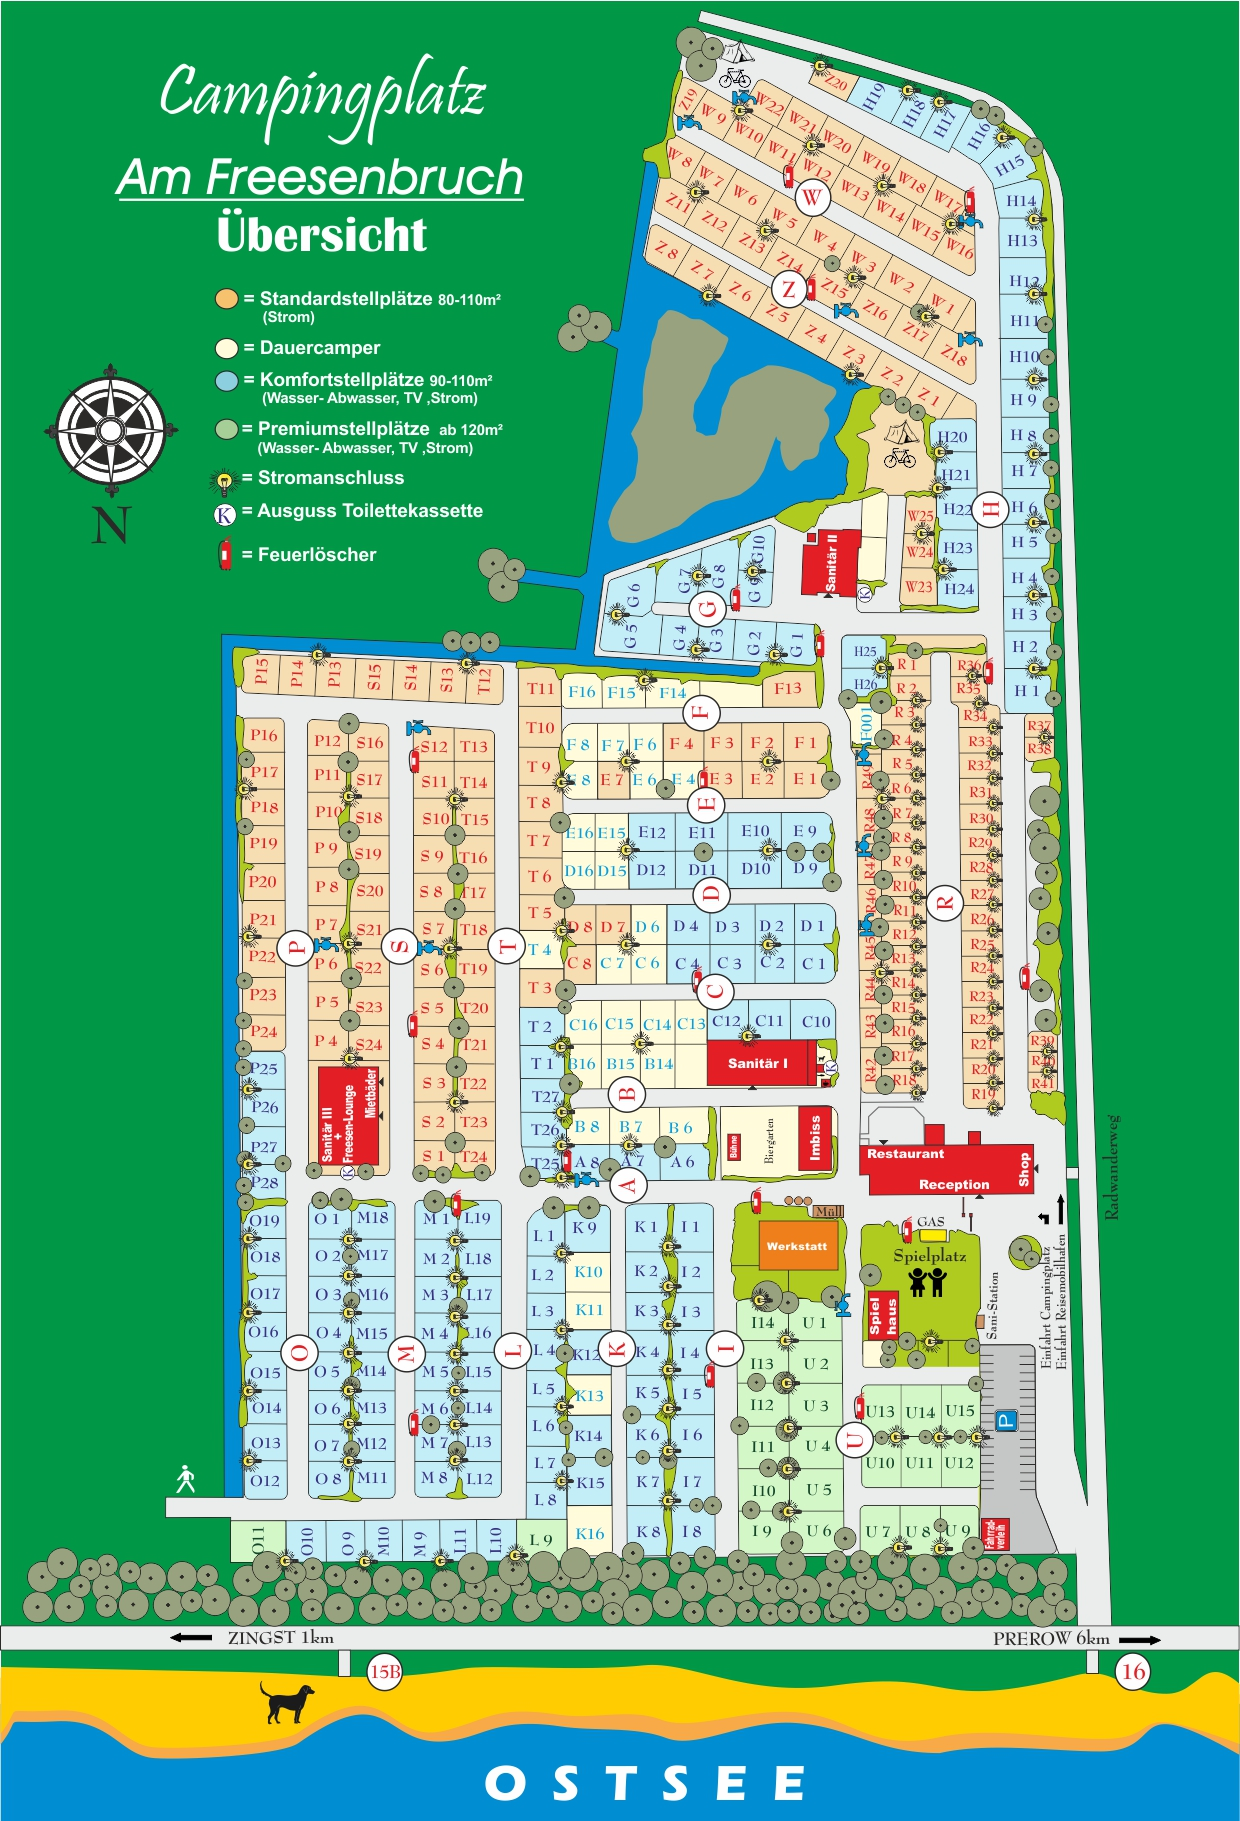 Campingplatz am Freesenbruch - Campground Map on